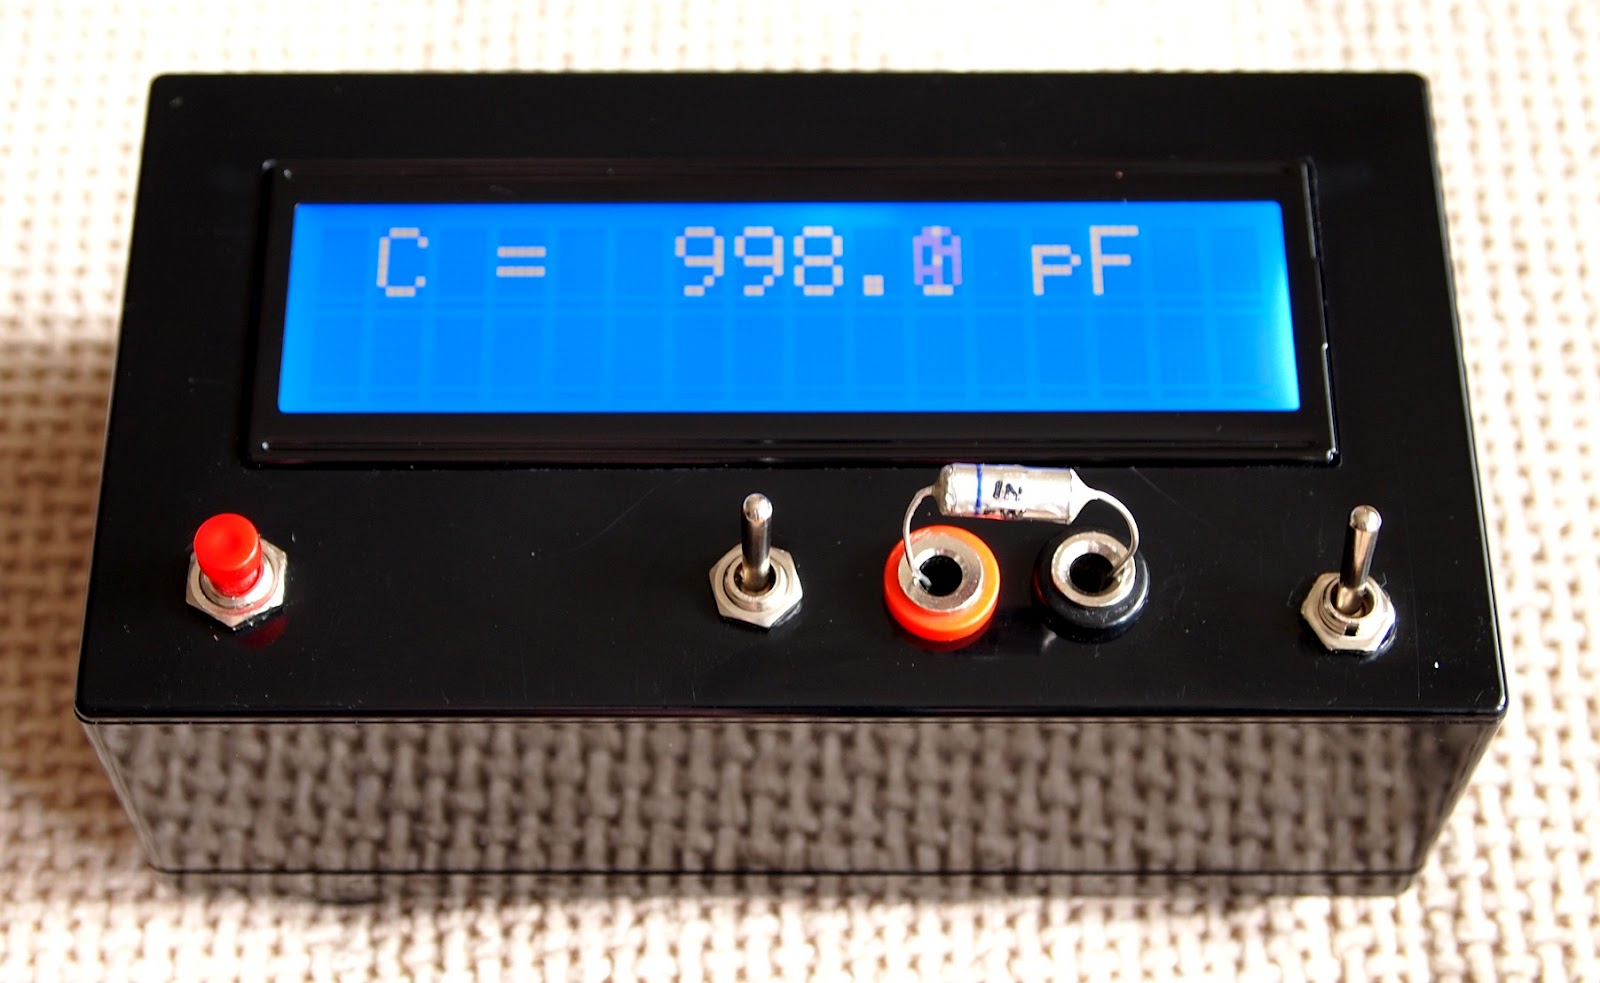 Electric Meter Wiring Diagram Lc2a Libraries Digital Emprendedor Link On Amp